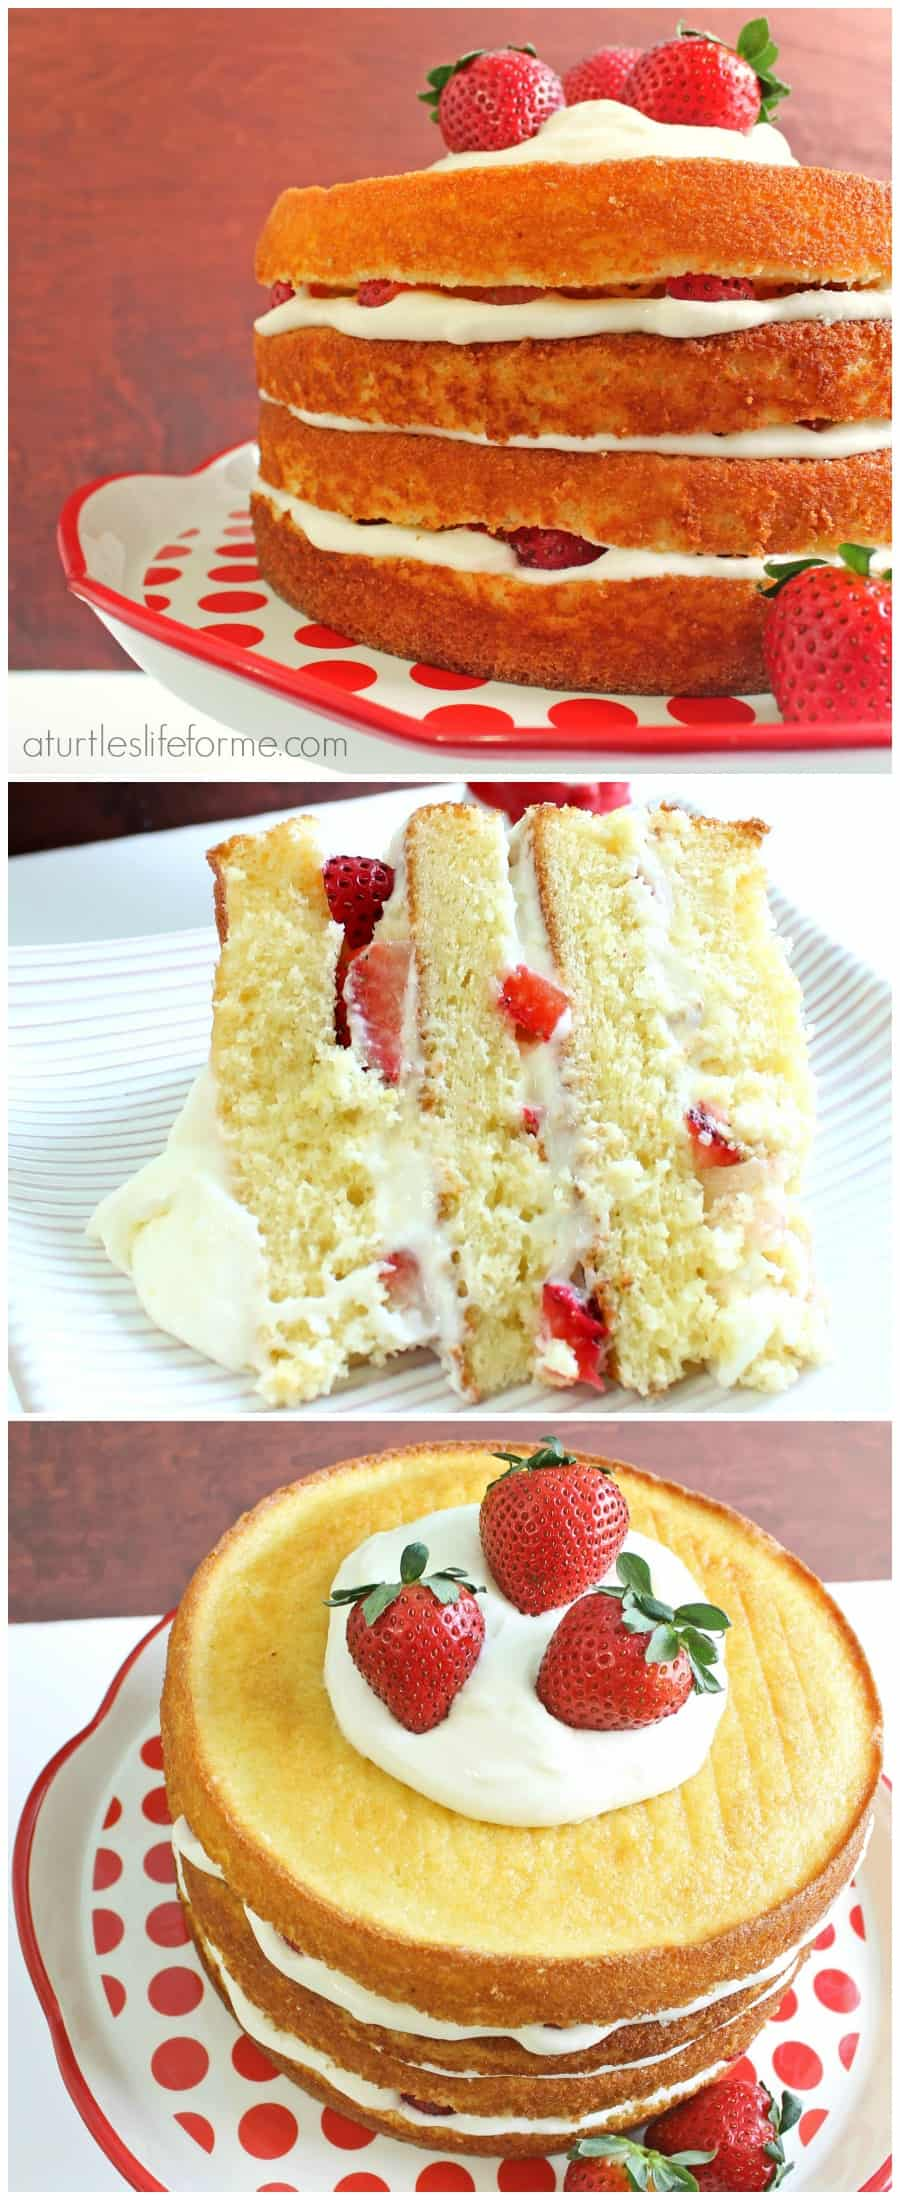 Strawberry Lemon Cake Recipe - A Turtle's Life for Me